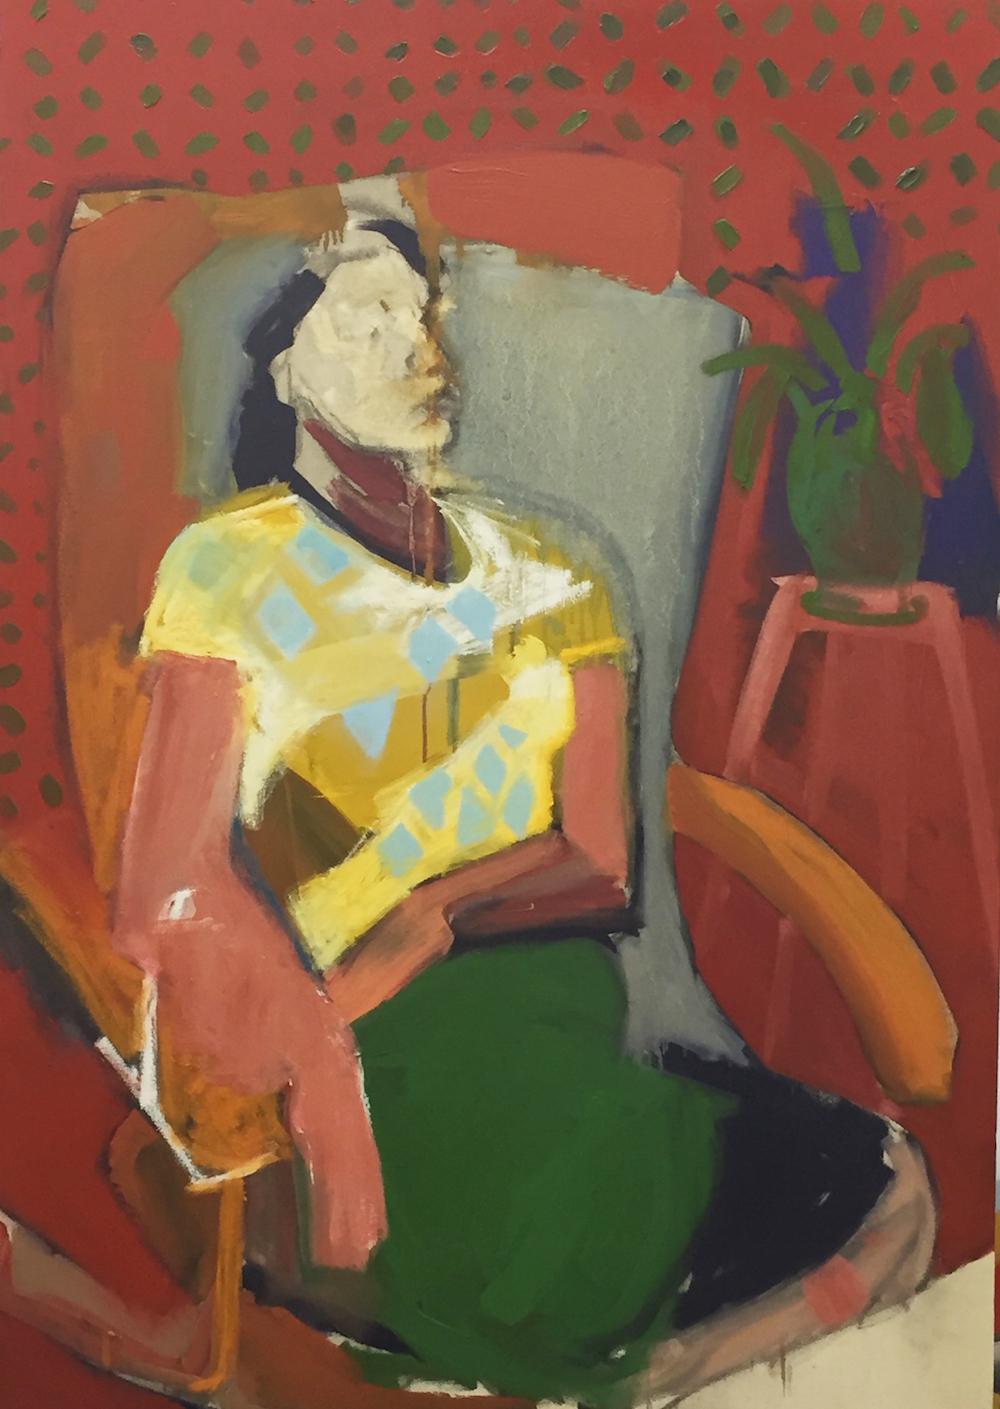 Ella Squirrell, Dancing plant, Oil paint on canvas, 100cm x 145cms x 4,  http://ellasquirrell.format.com/5154846-home